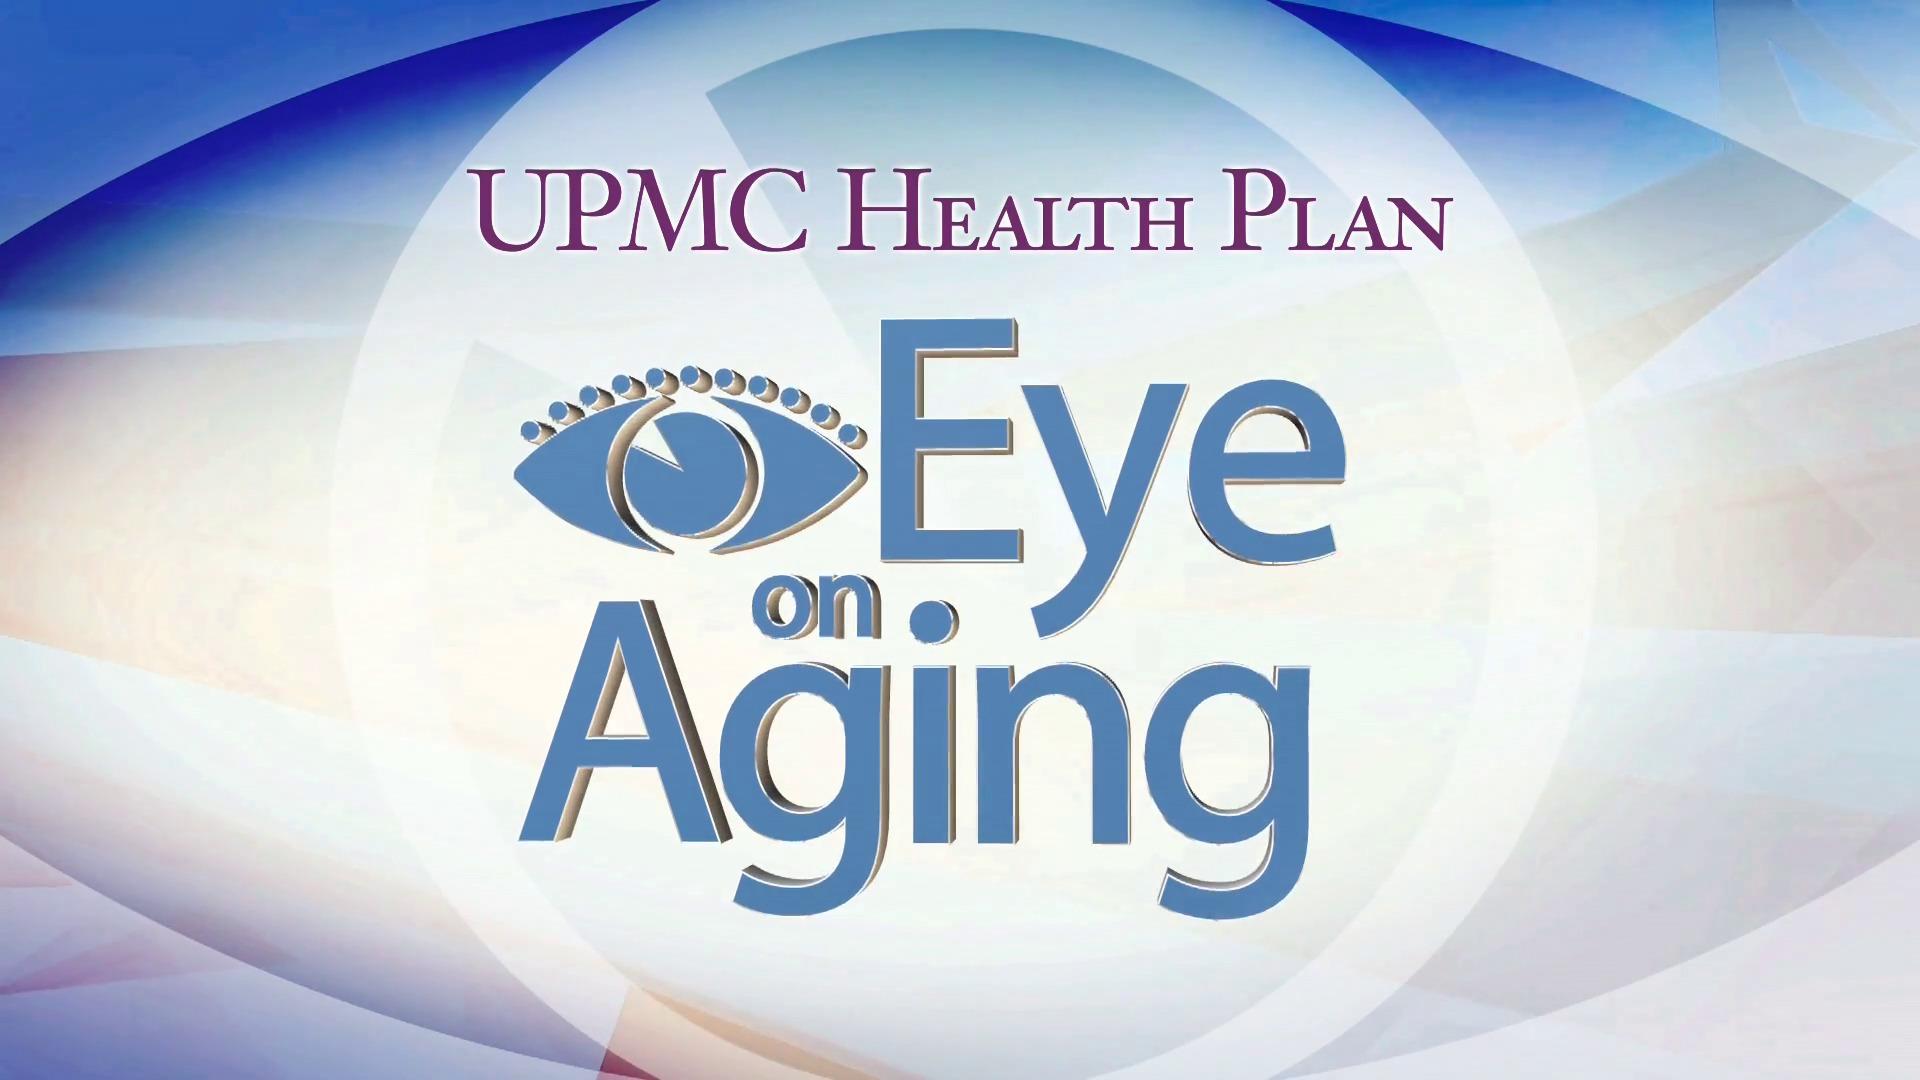 Medicare Plans with Prescription Drug Coverage | UPMC for Life